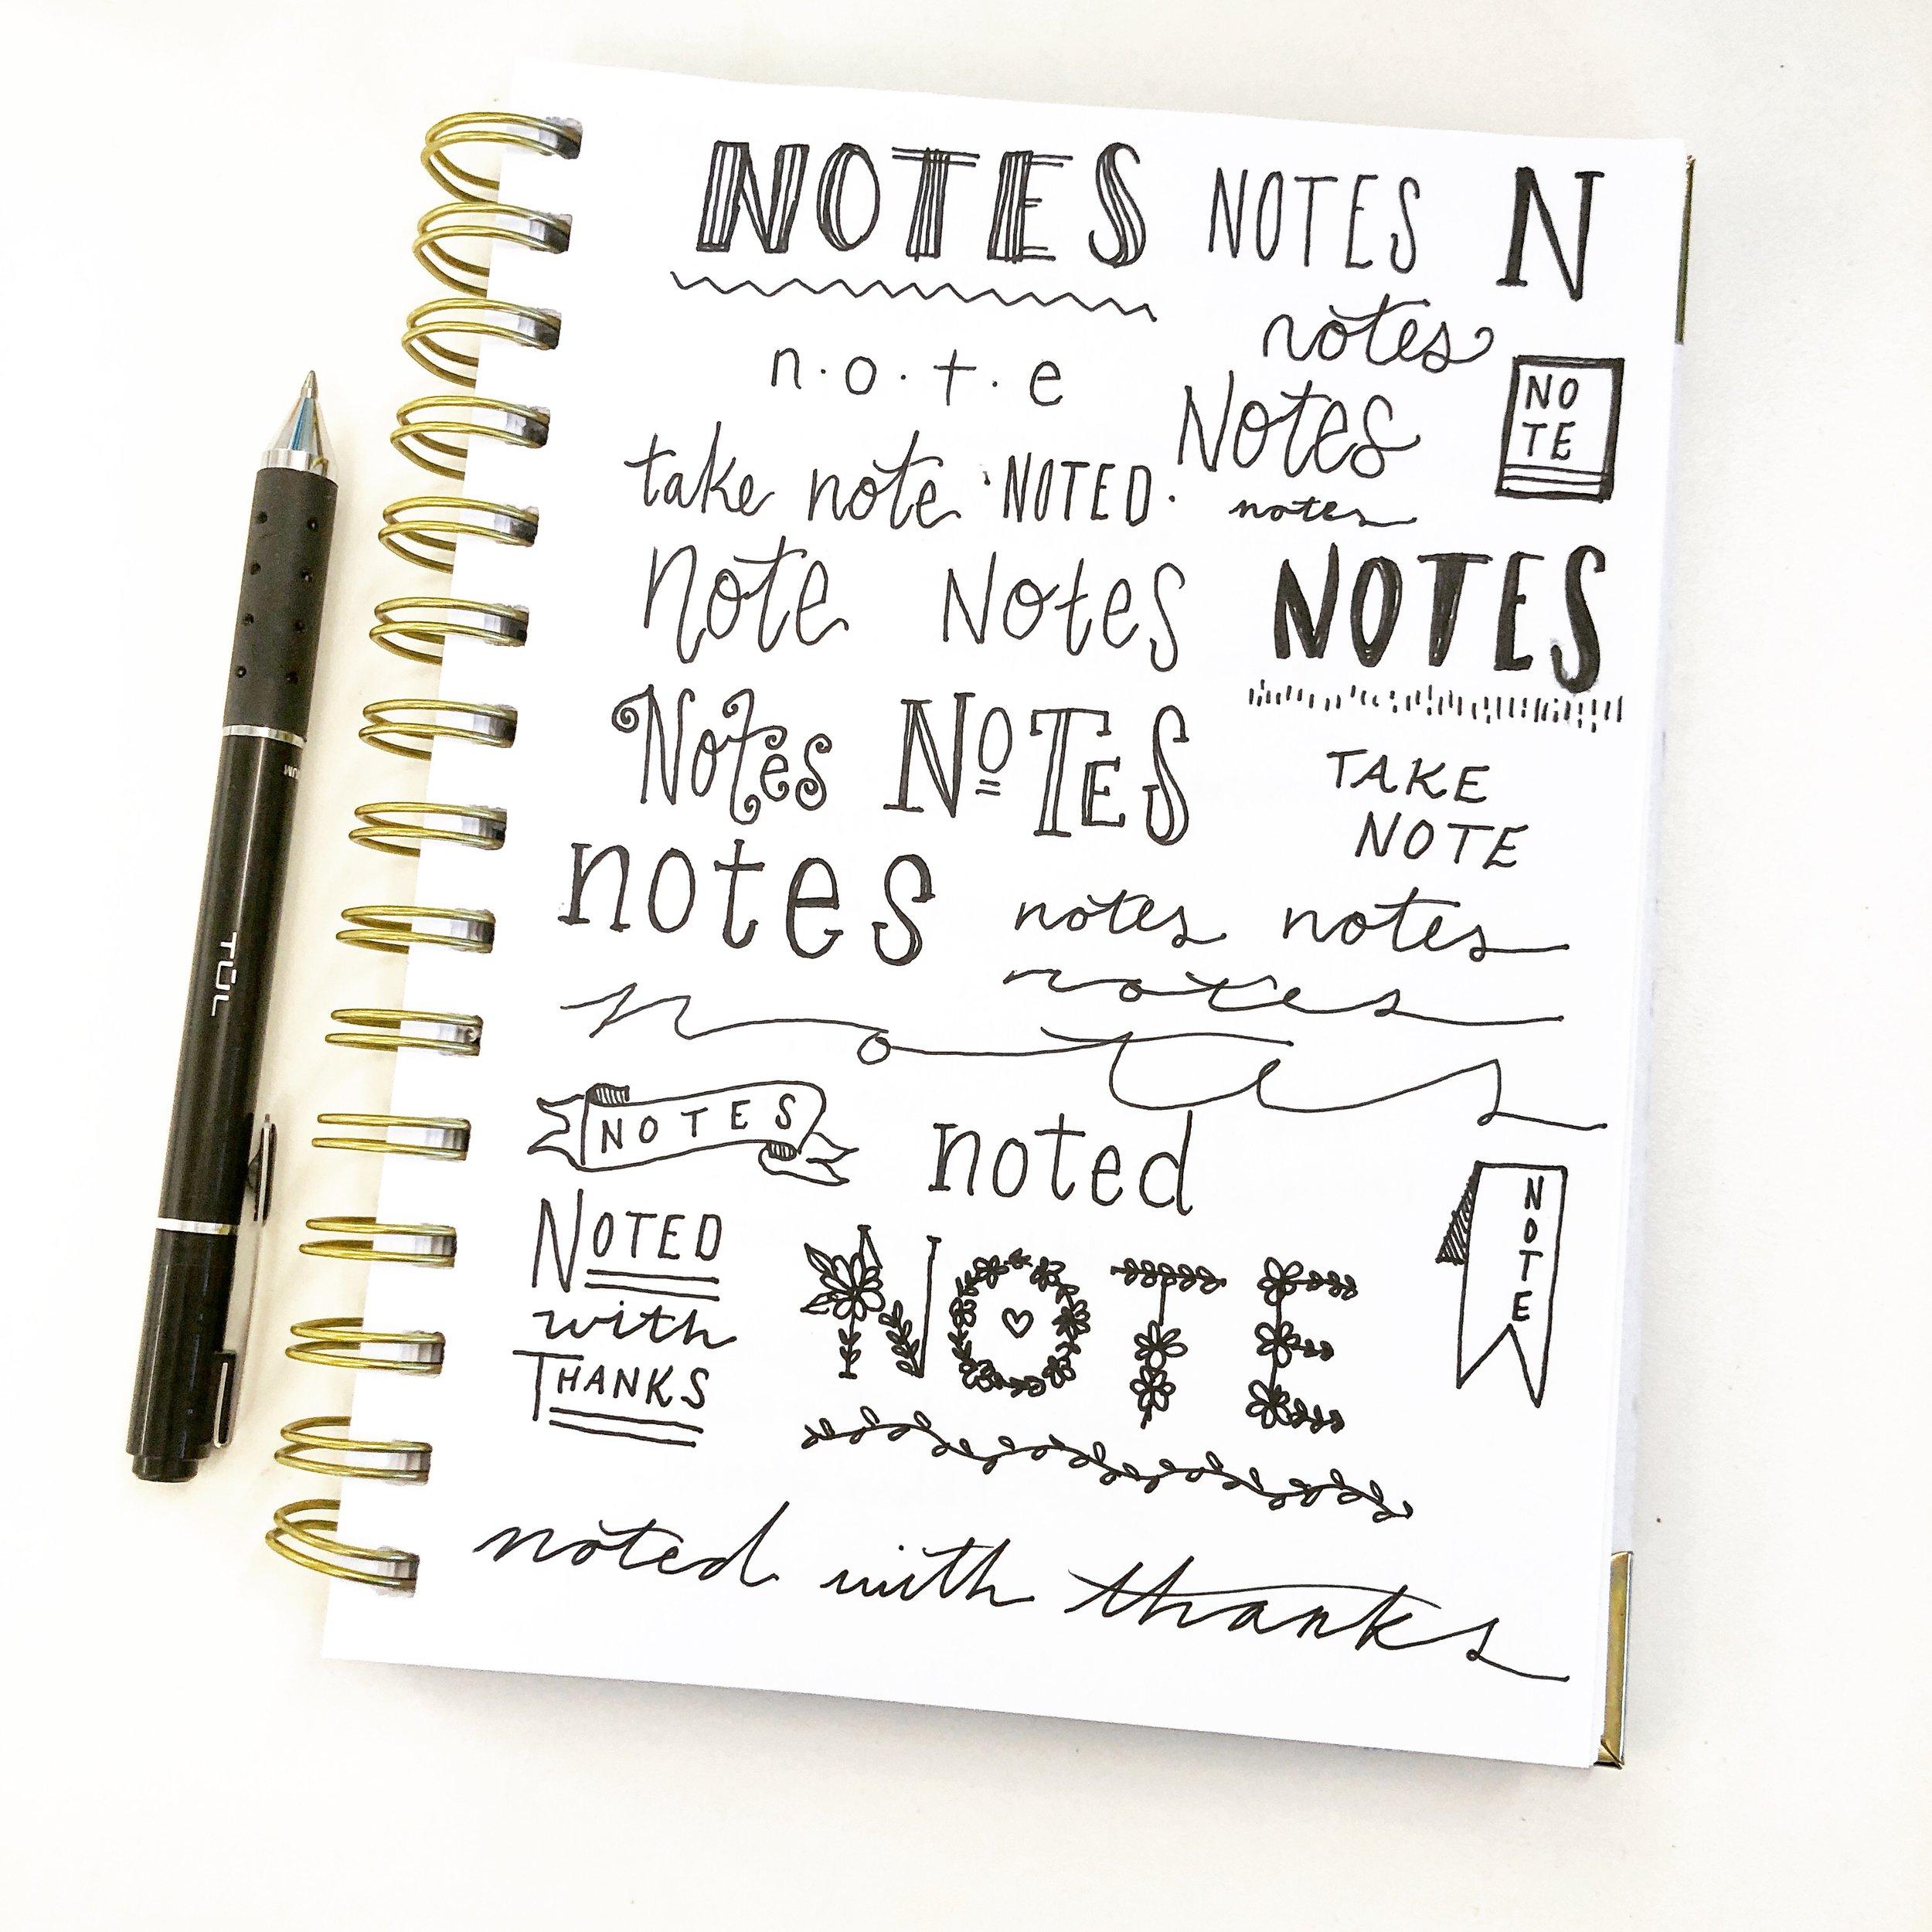 notes_sketch.JPG